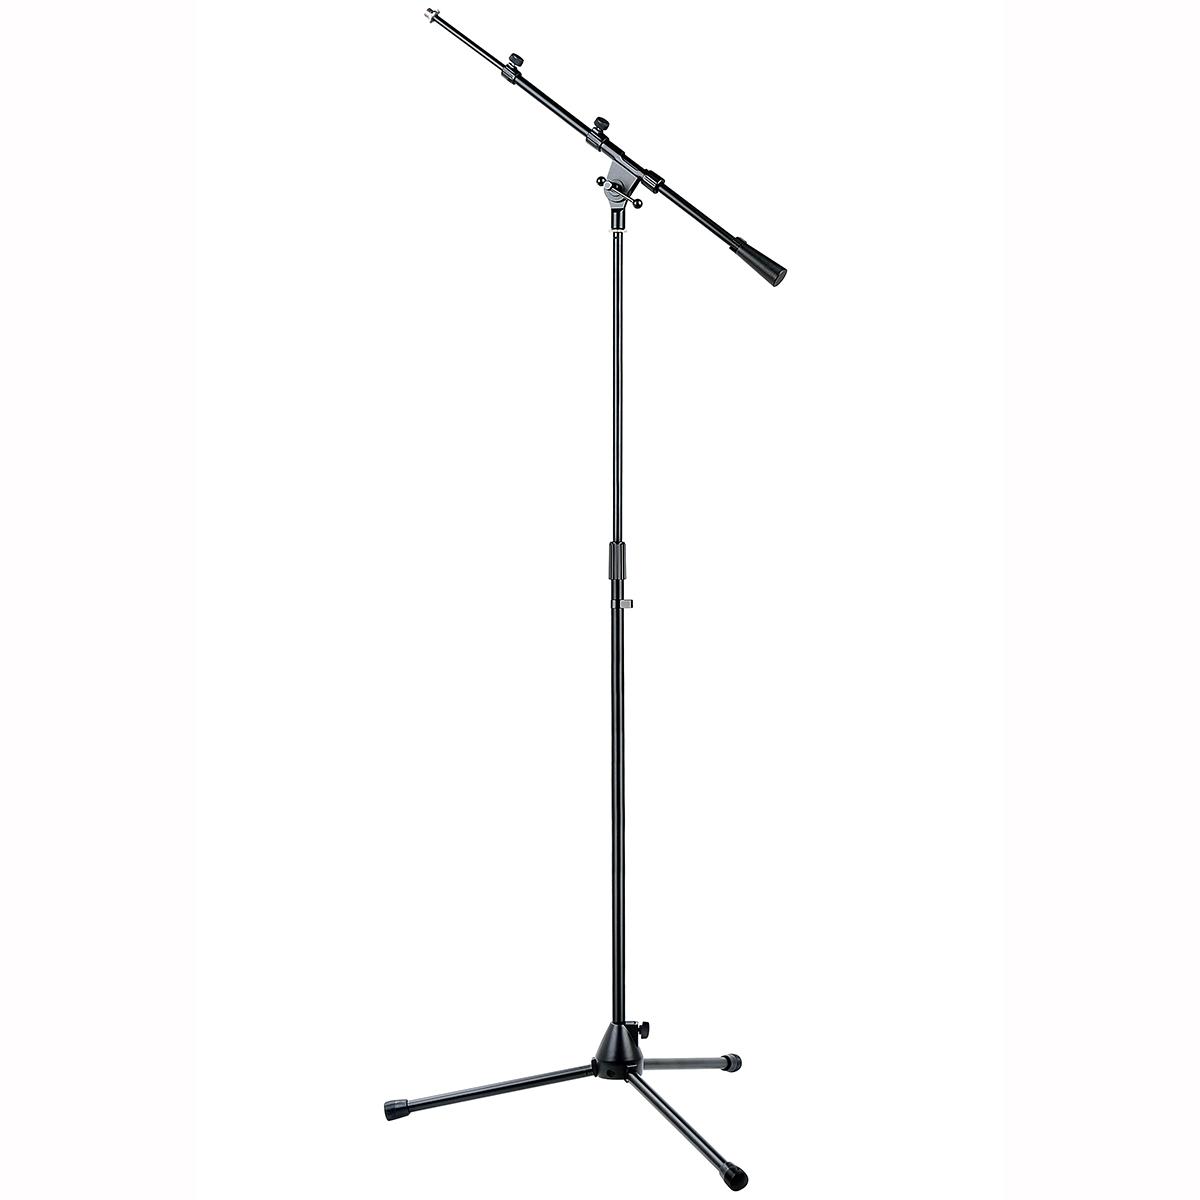 ASTA MICROFONO SOUNDSATION SMICS-200-BK